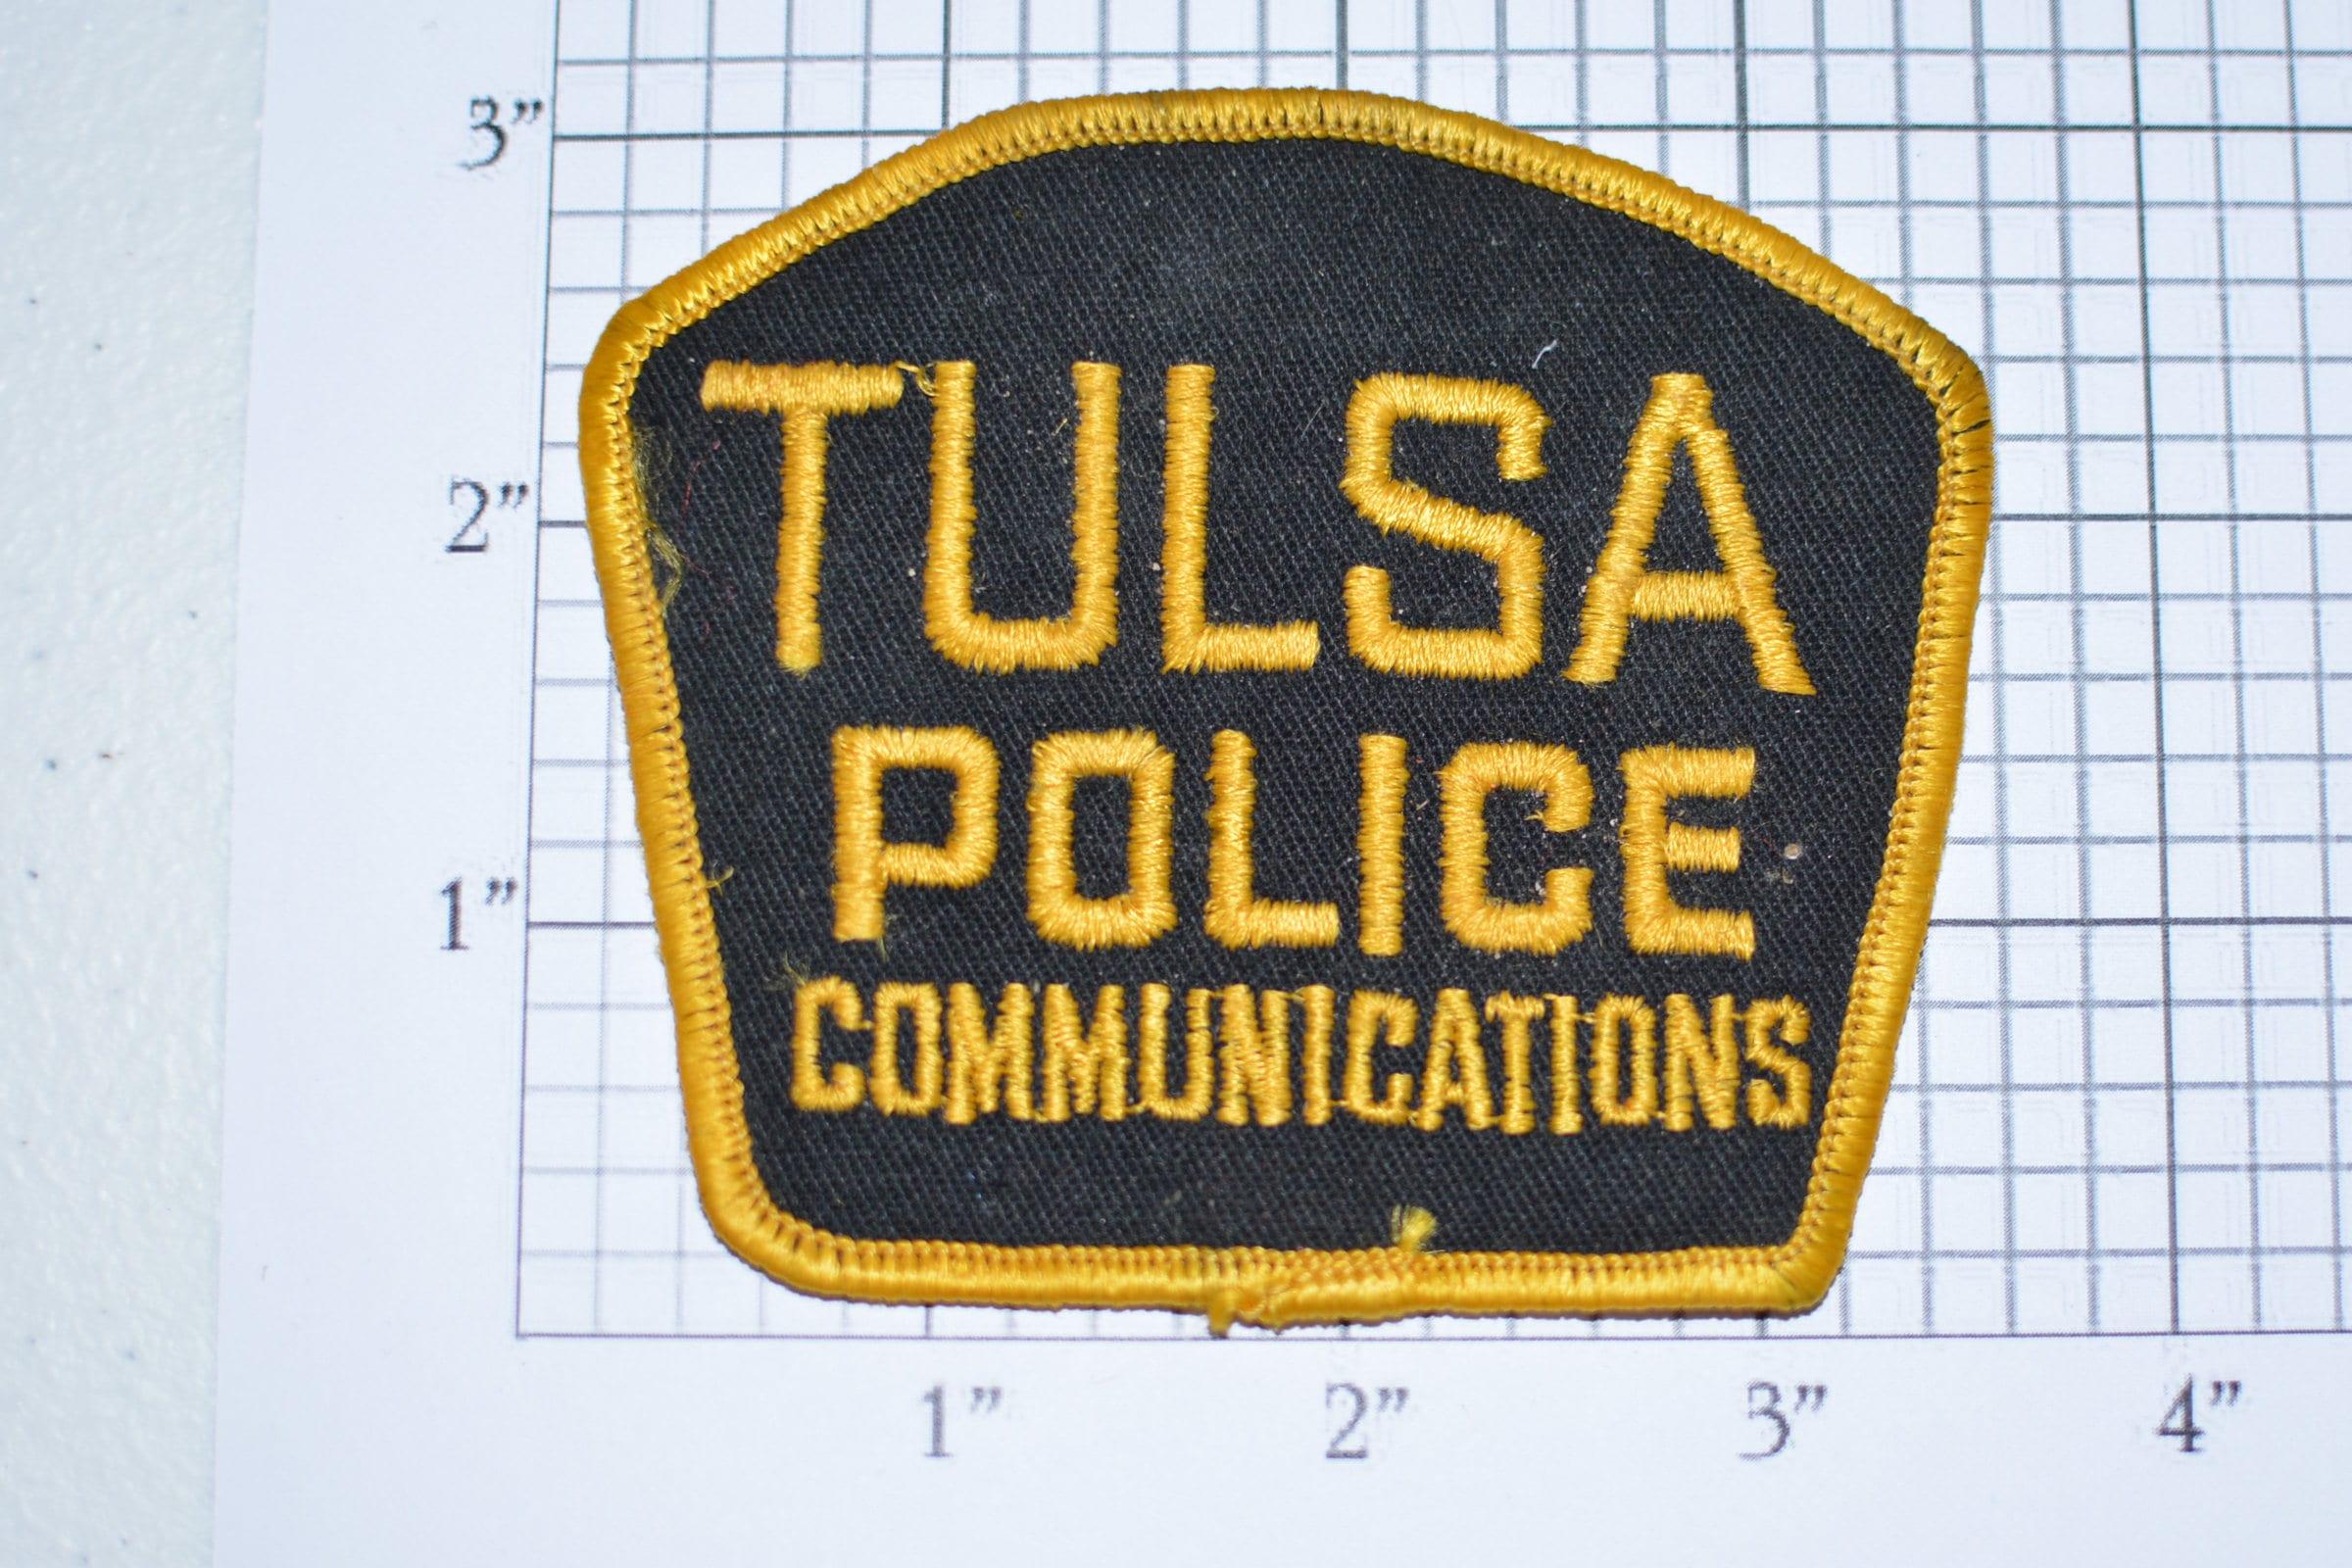 Tulsa Oklahoma Police Communications Very Rare Sew On Vintage